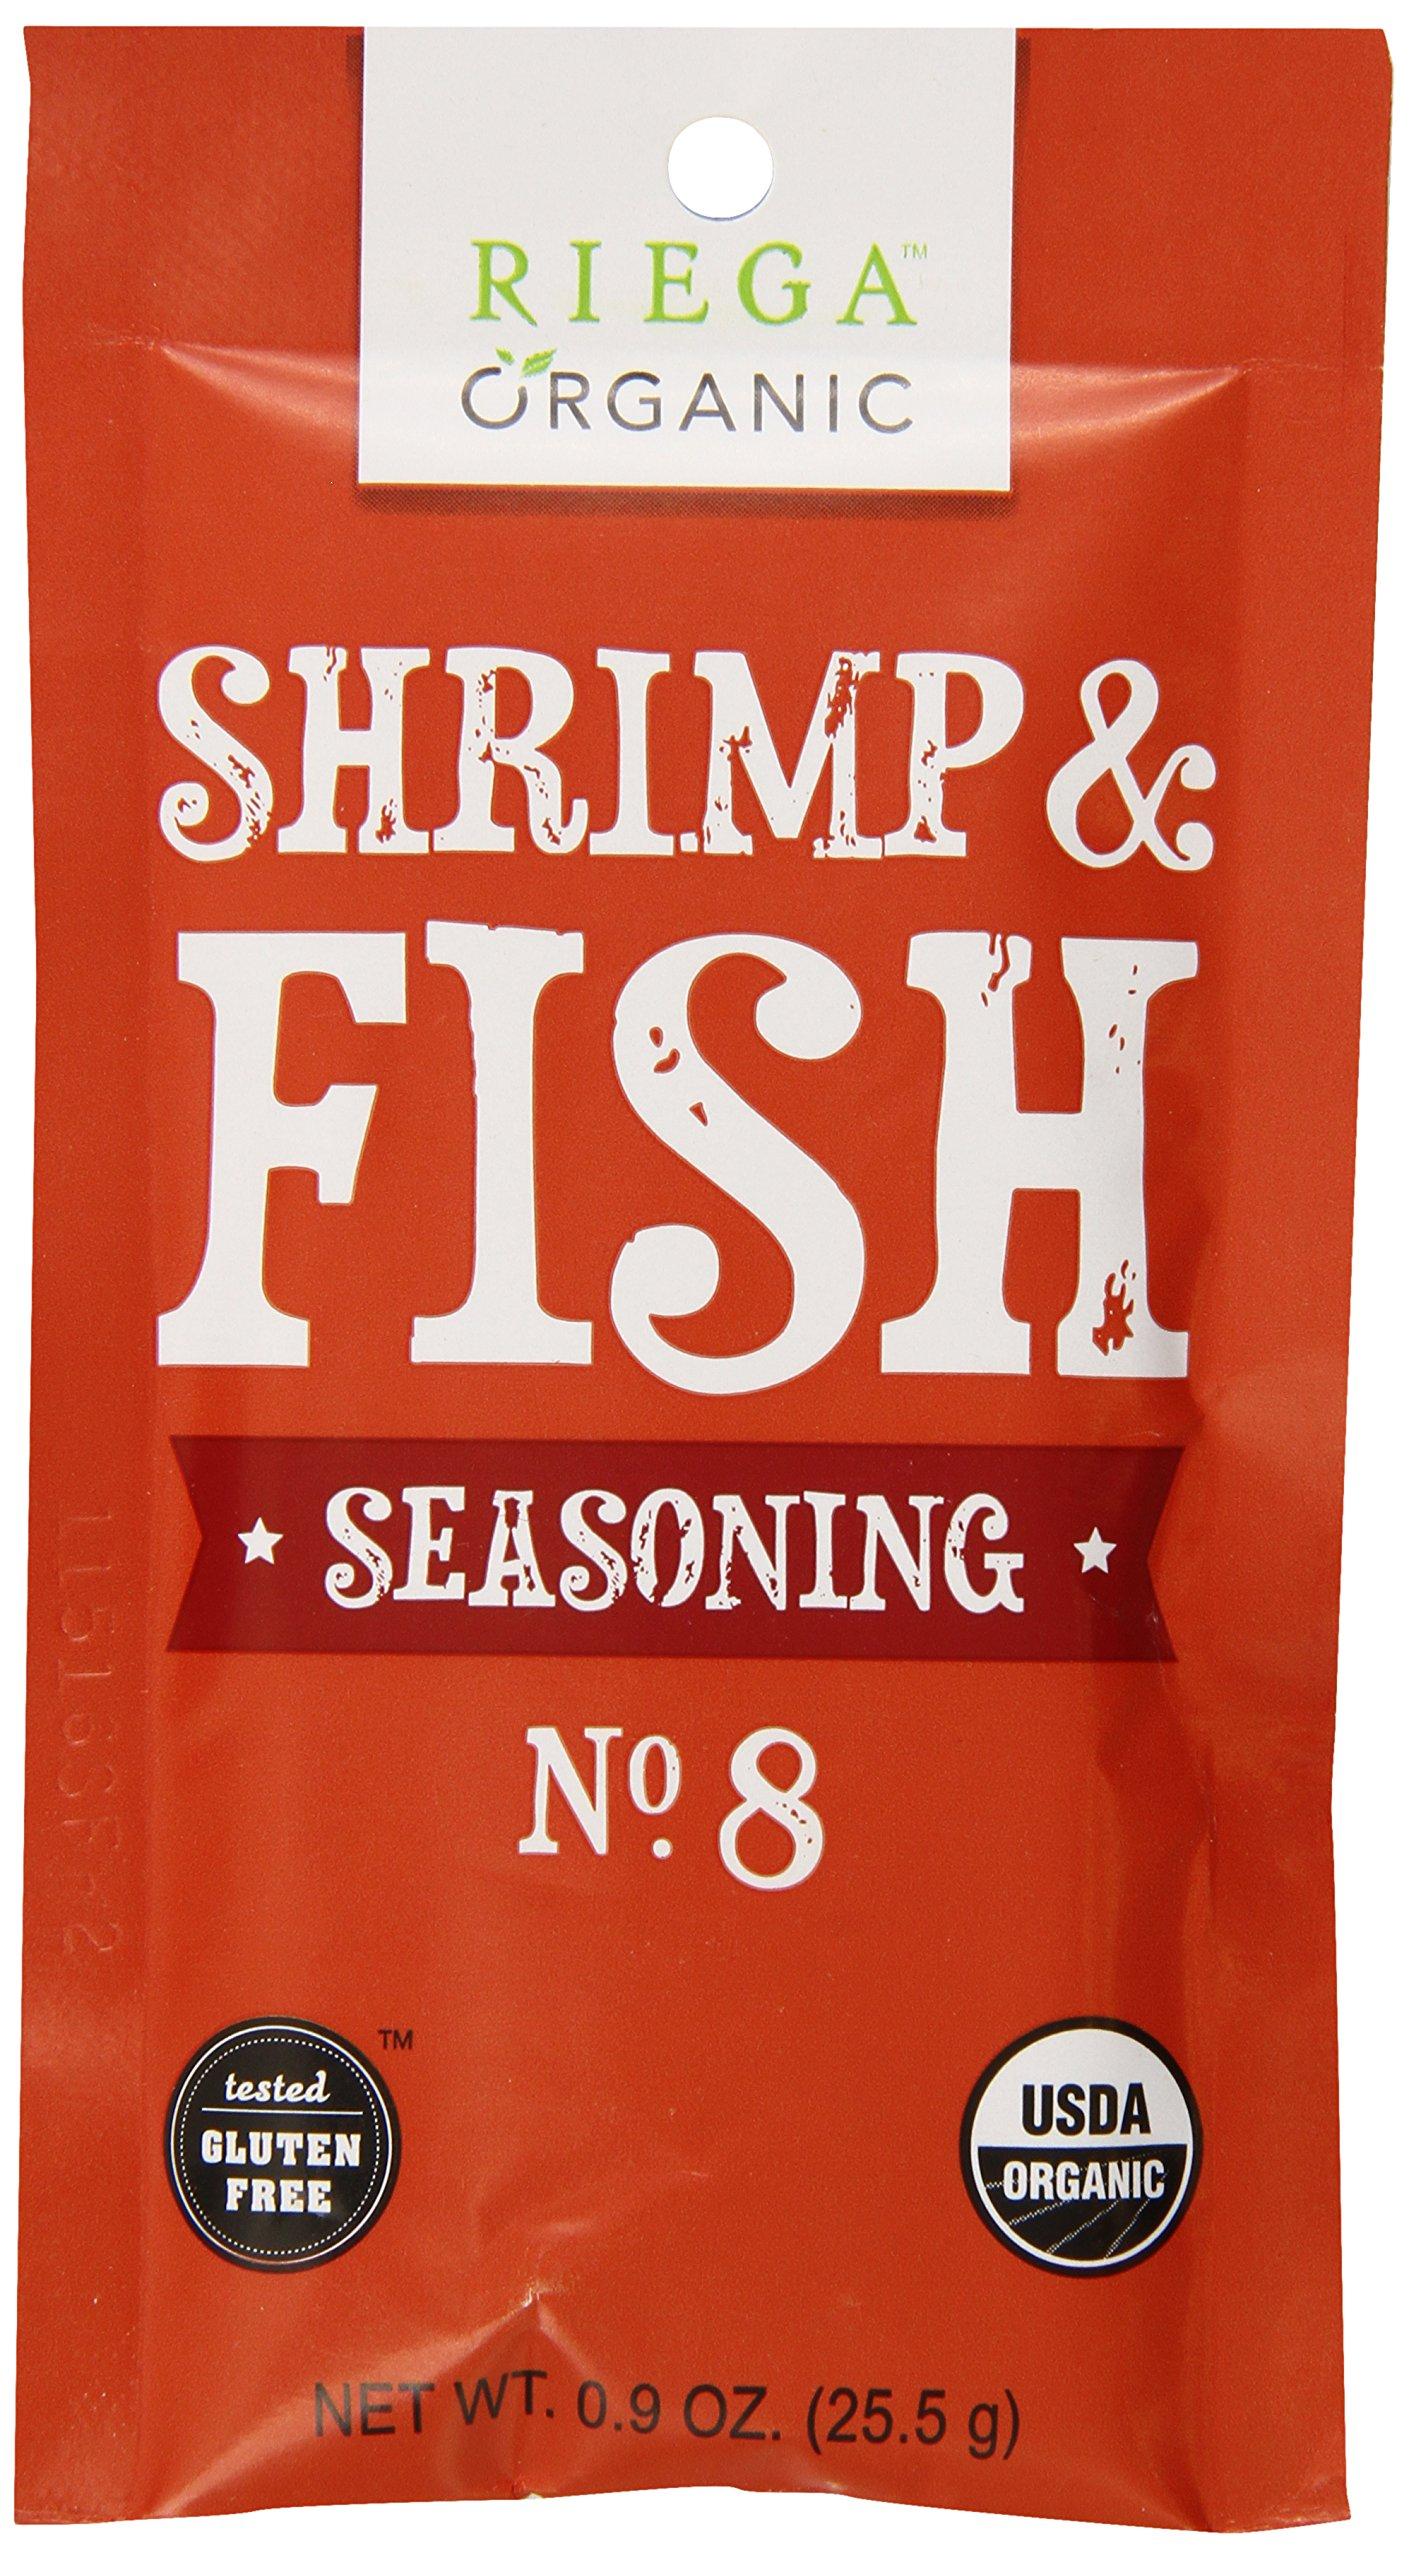 Riega Organic Shrimp and Fish Seasoning (Pack of 8) by Riega